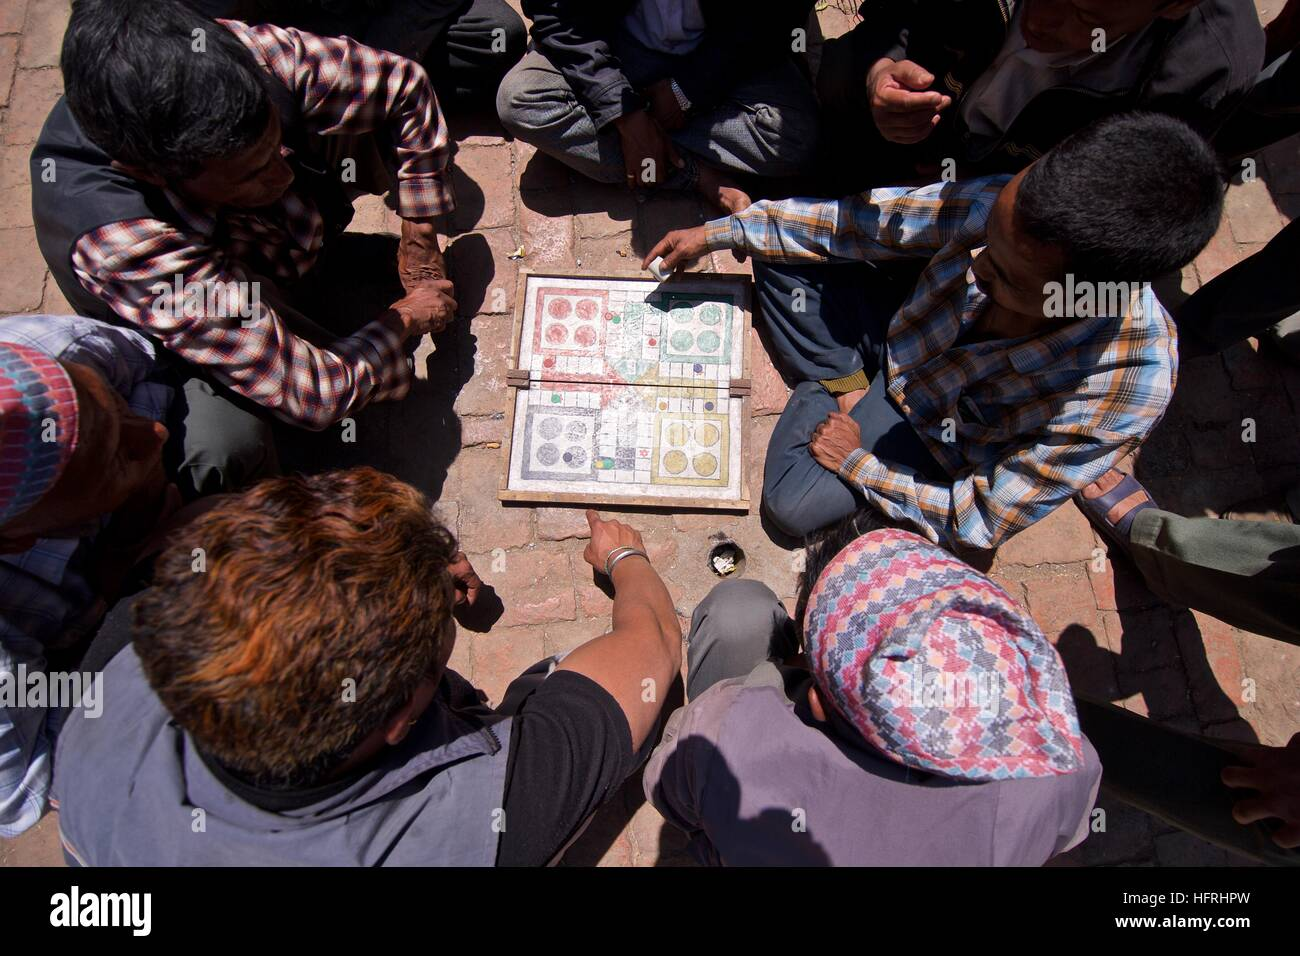 Nepal Kathmandu Asia street scene candid board game playing local - Stock Image